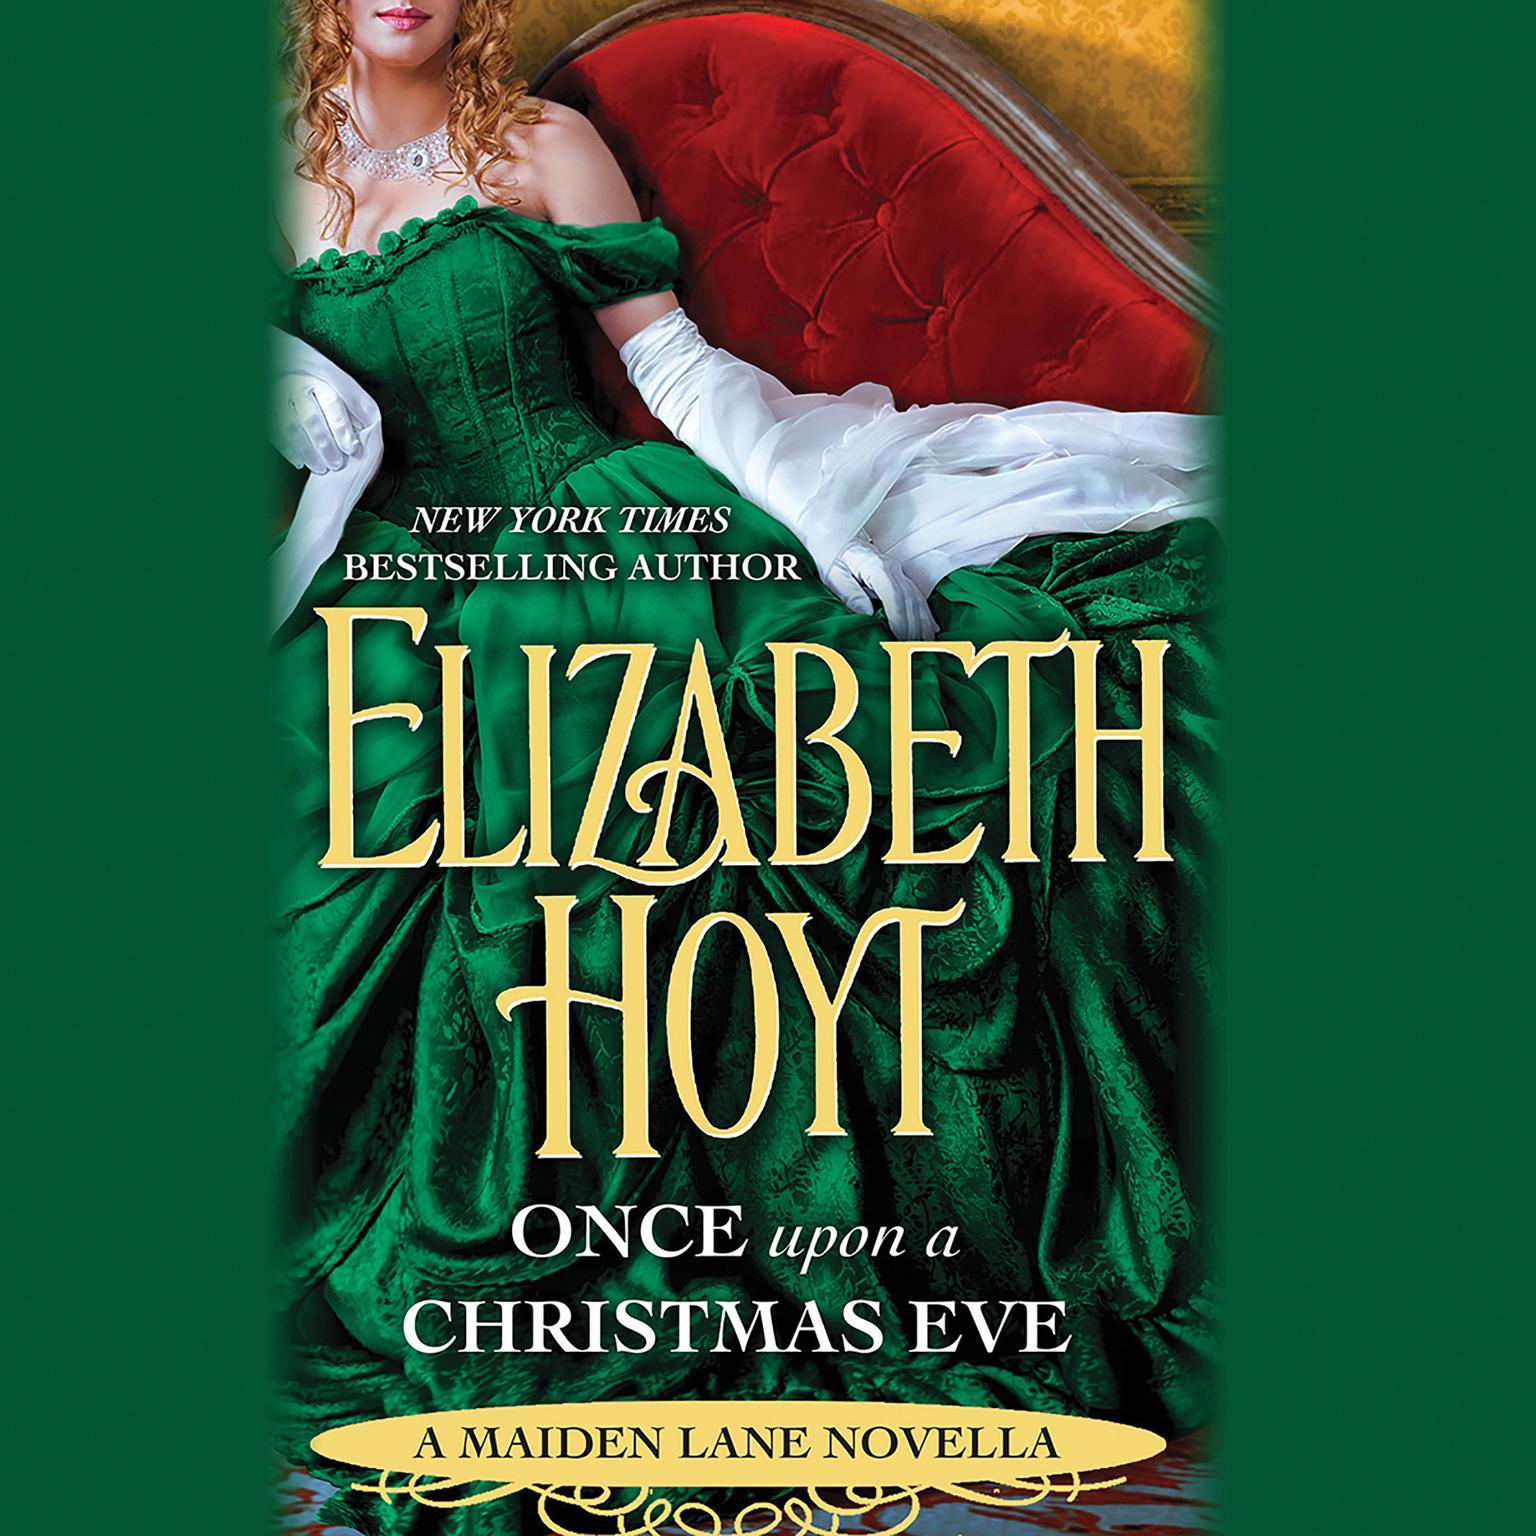 Once Upon a Christmas Eve: A Maiden Lane Novella Audiobook, by Elizabeth Hoyt